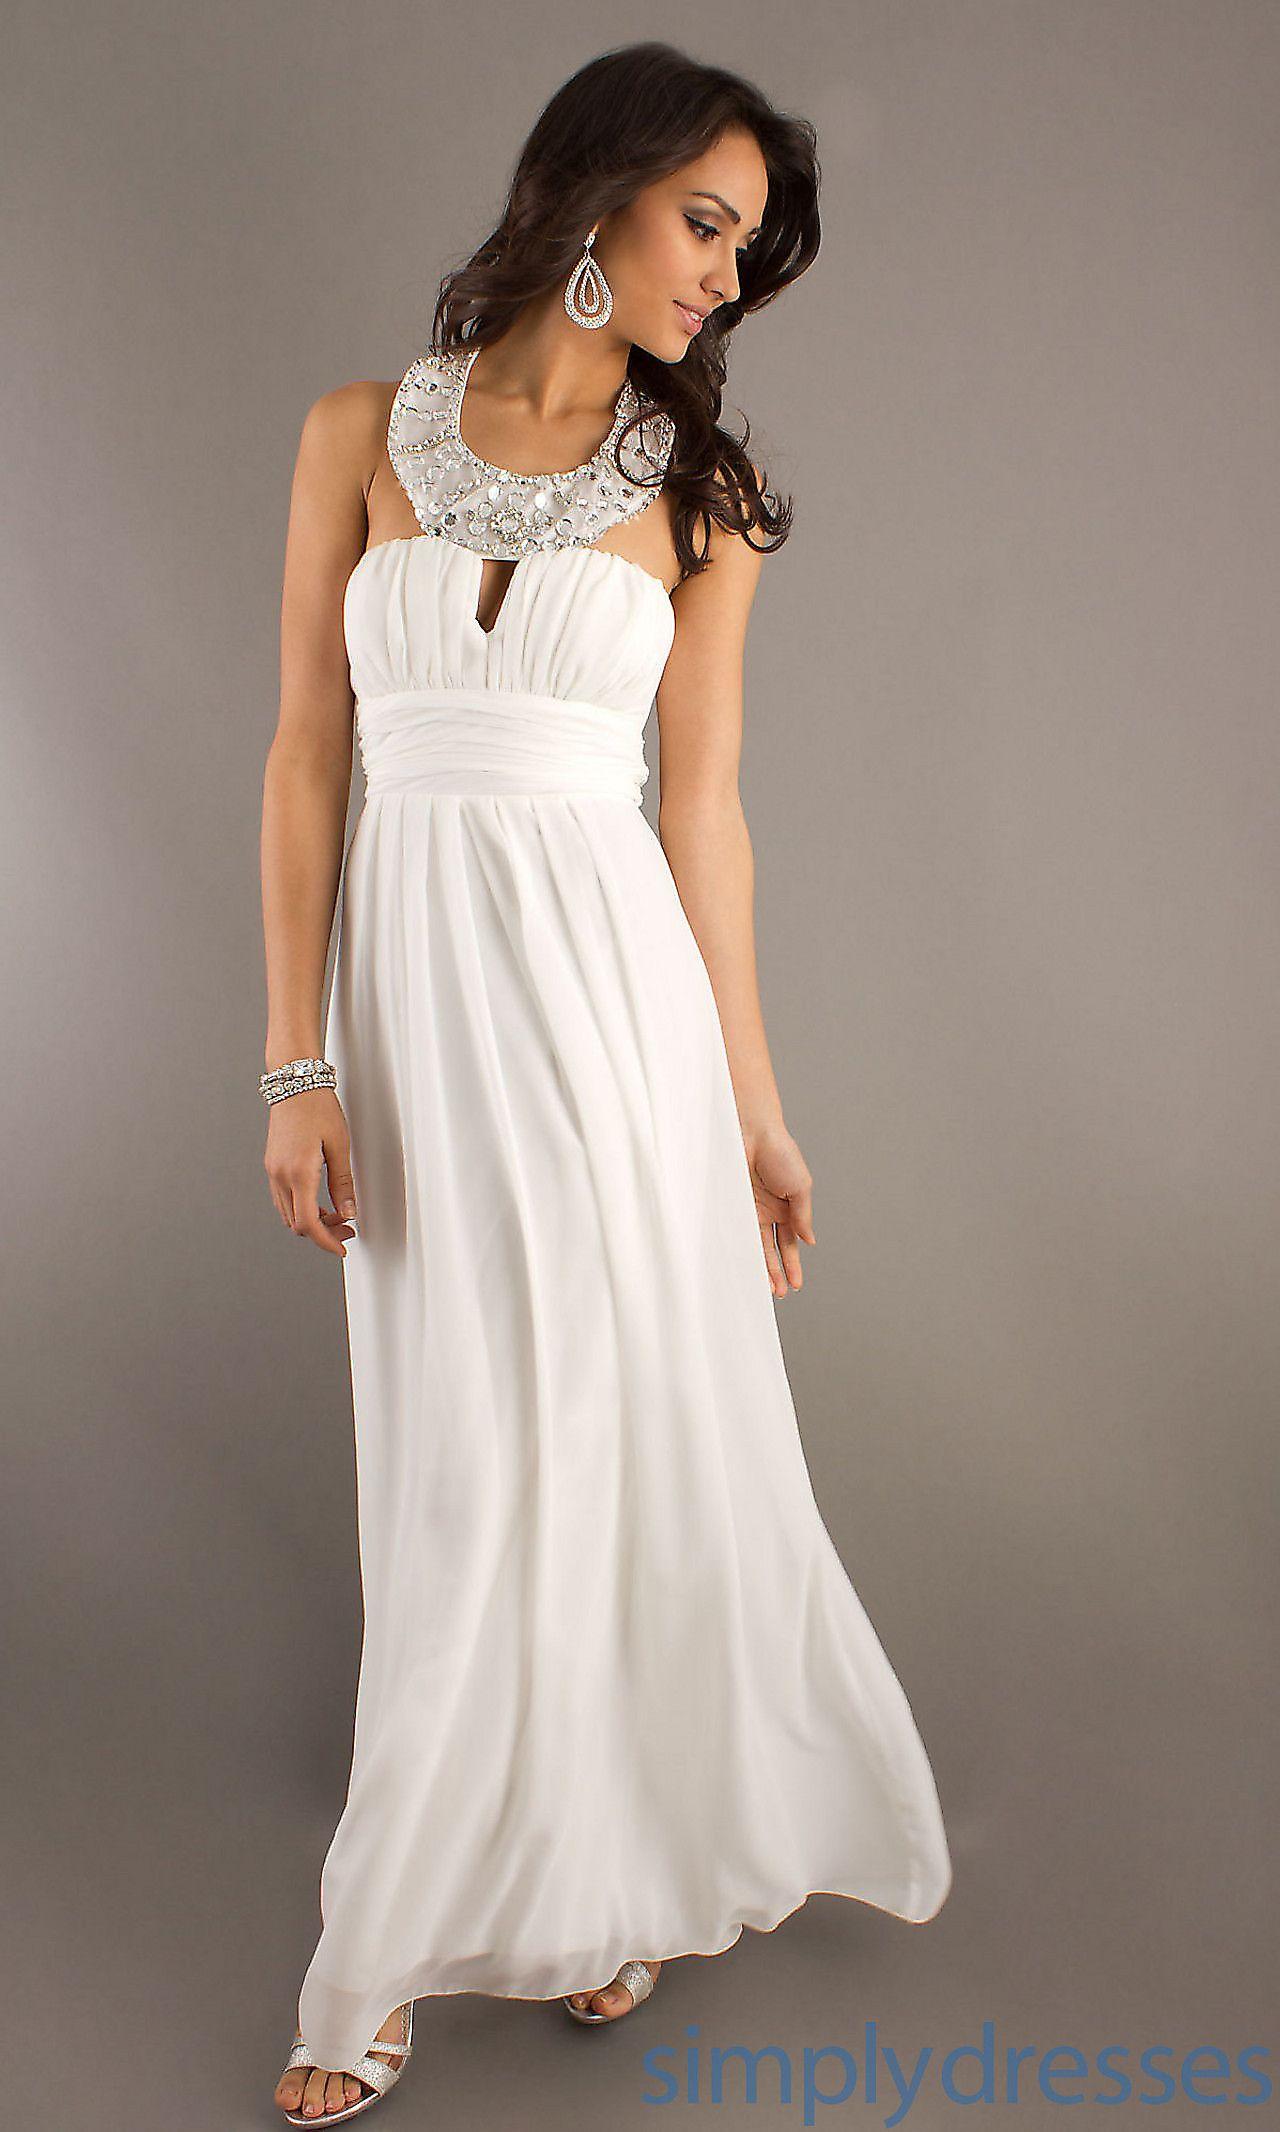 150.. Floor Length White Dress BD-0671556 | Princess at Heart ...